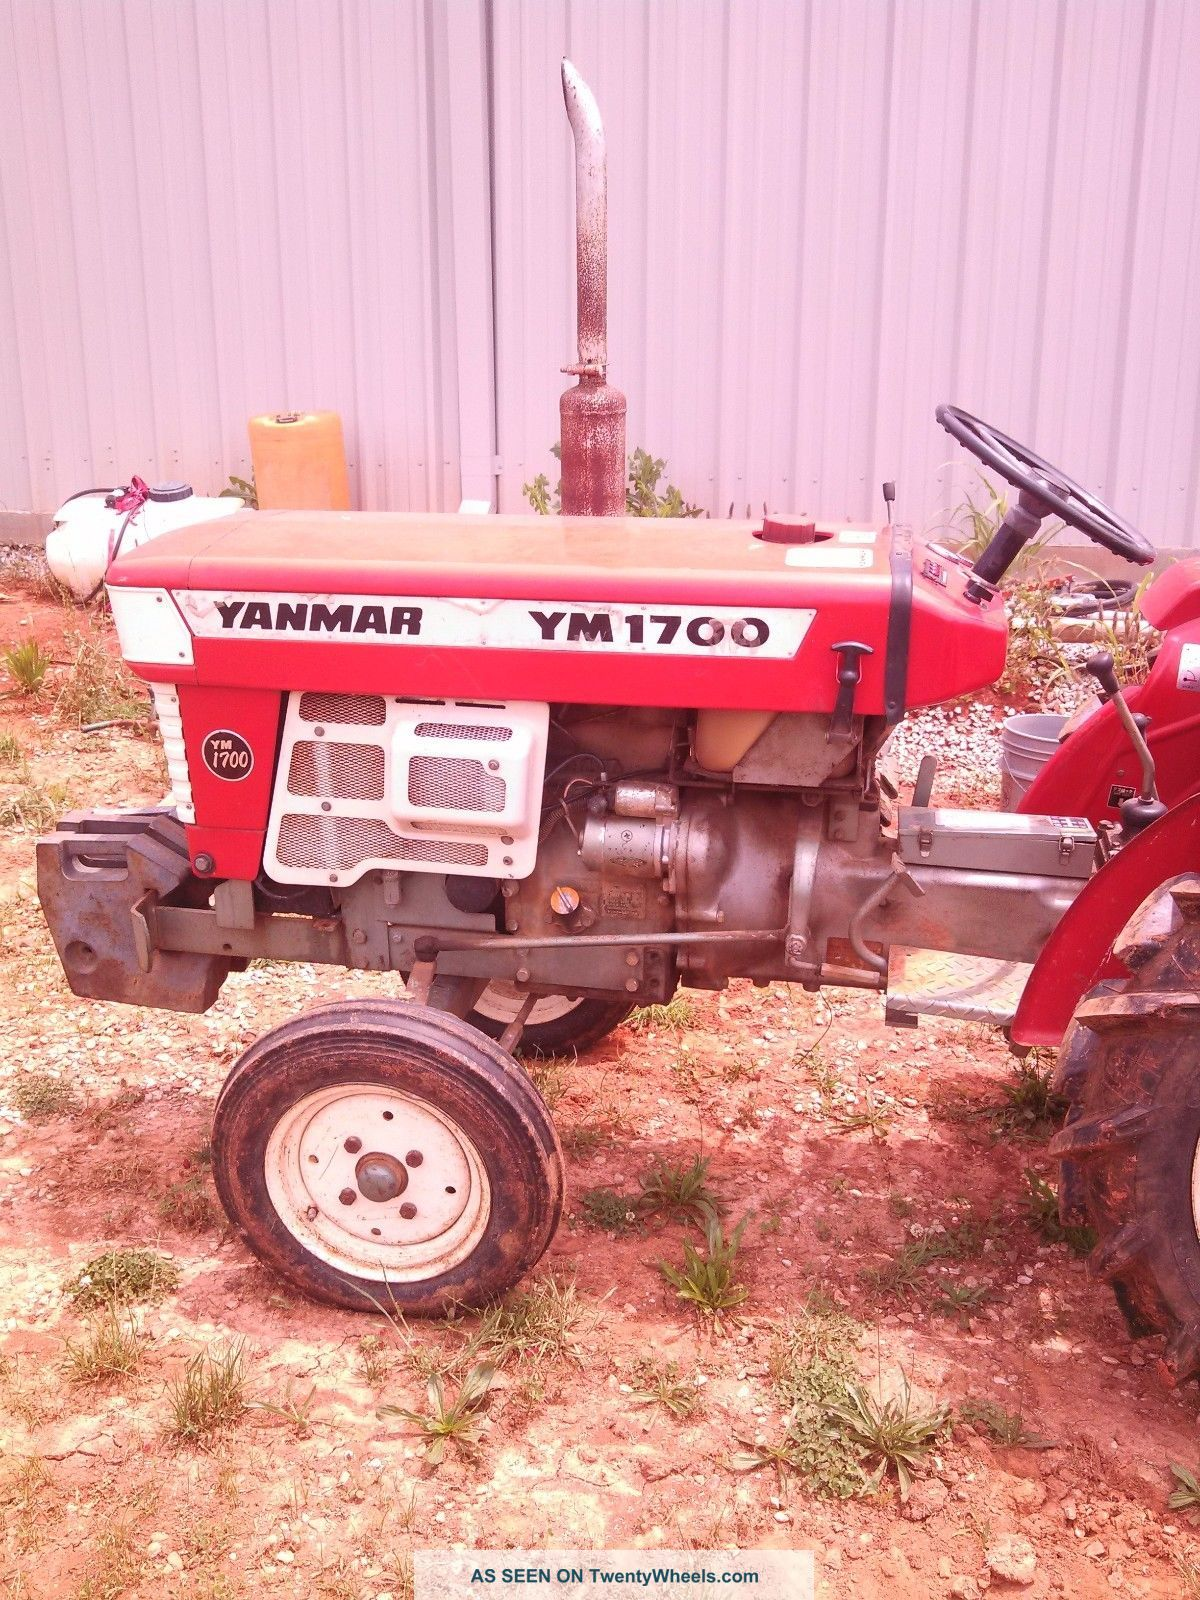 Yanmar Tractor 2 Wheel : Yanmar tractor w tiller